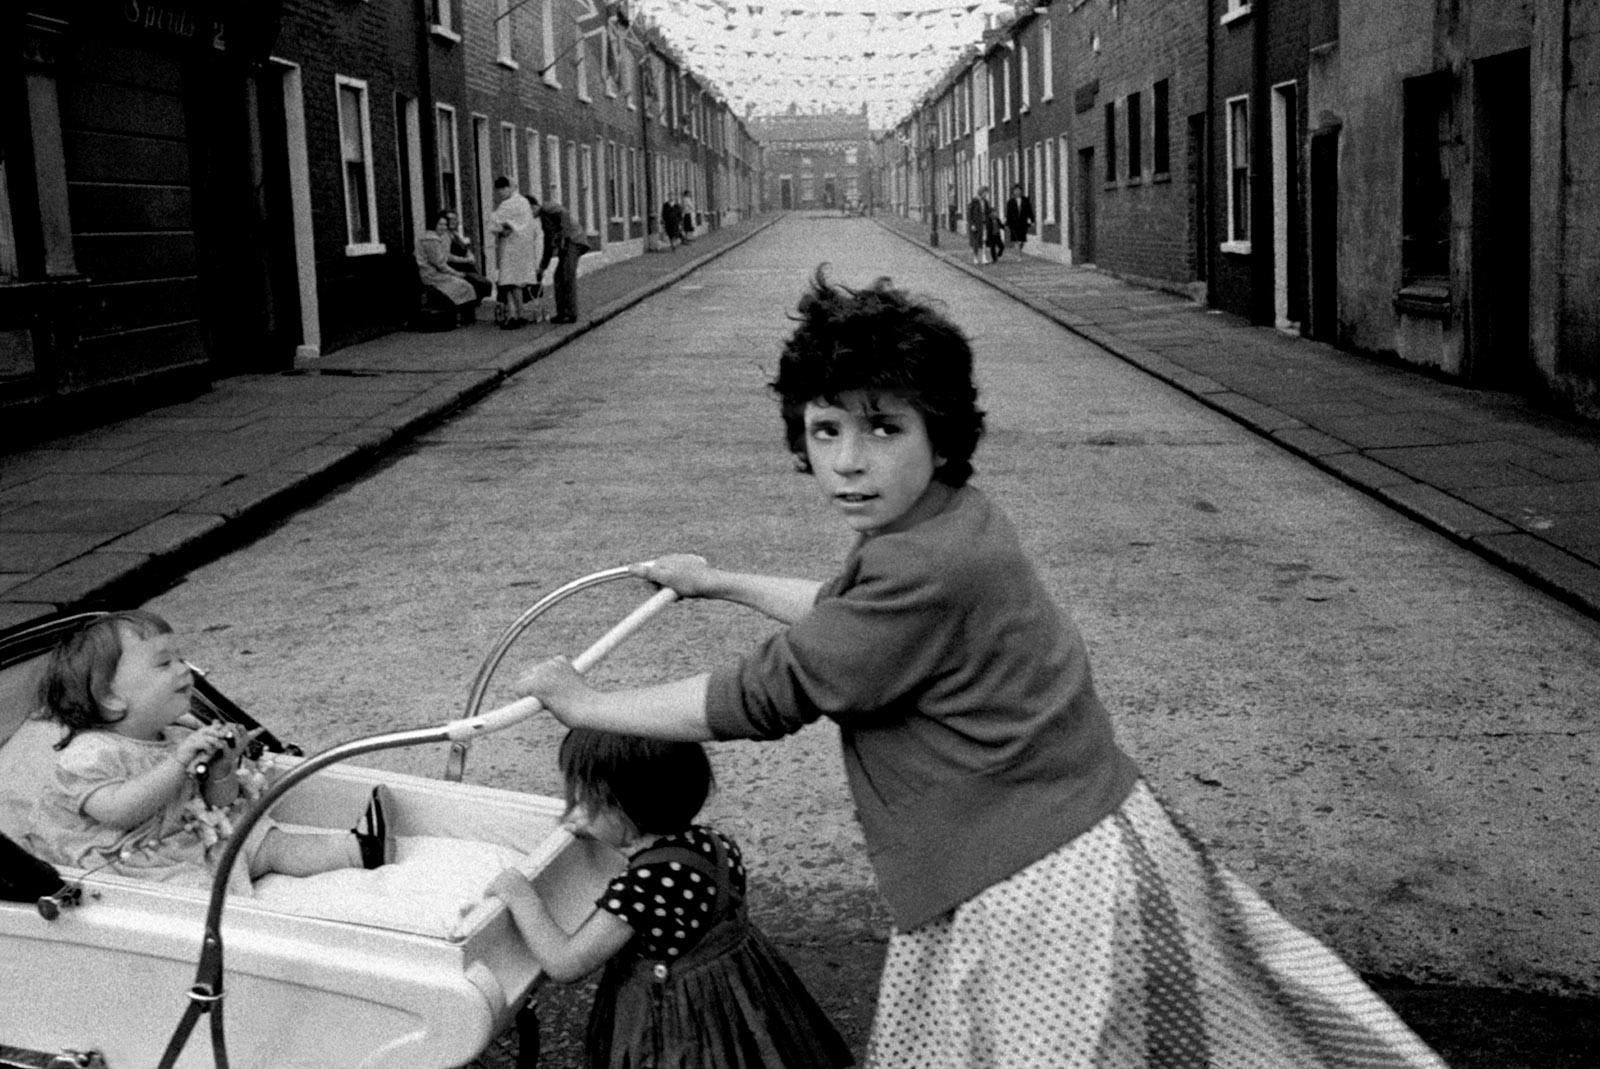 Belfast, Northern Ireland, 1965; photograph by Philip Jones Griffiths